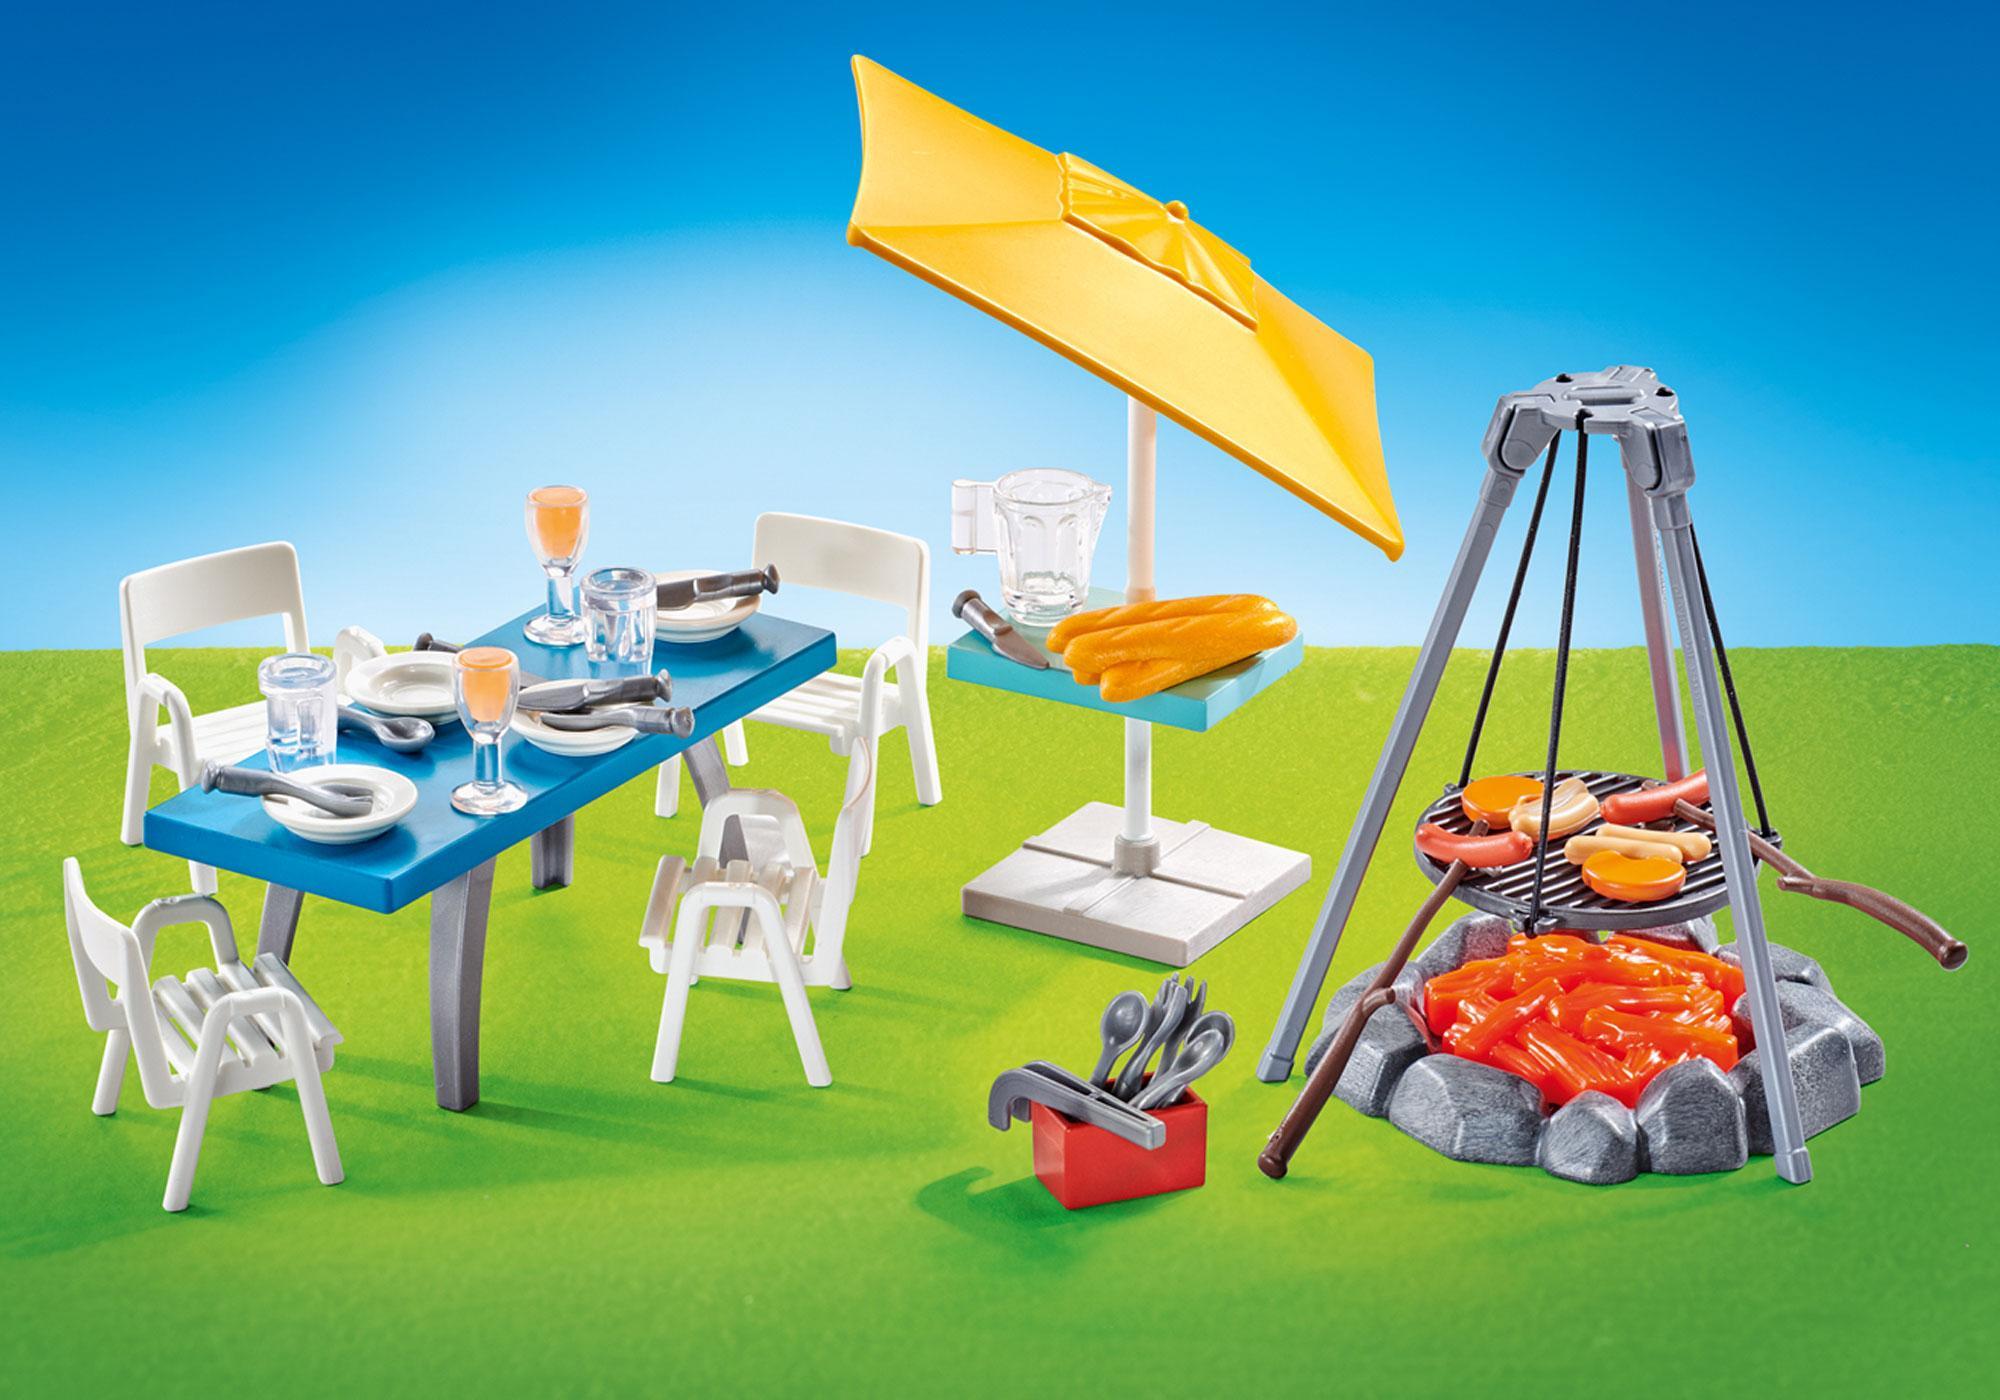 9818_product_detail/Μπάρμπεκιου με τραπέζι, καρέκλες και ομπρέλα